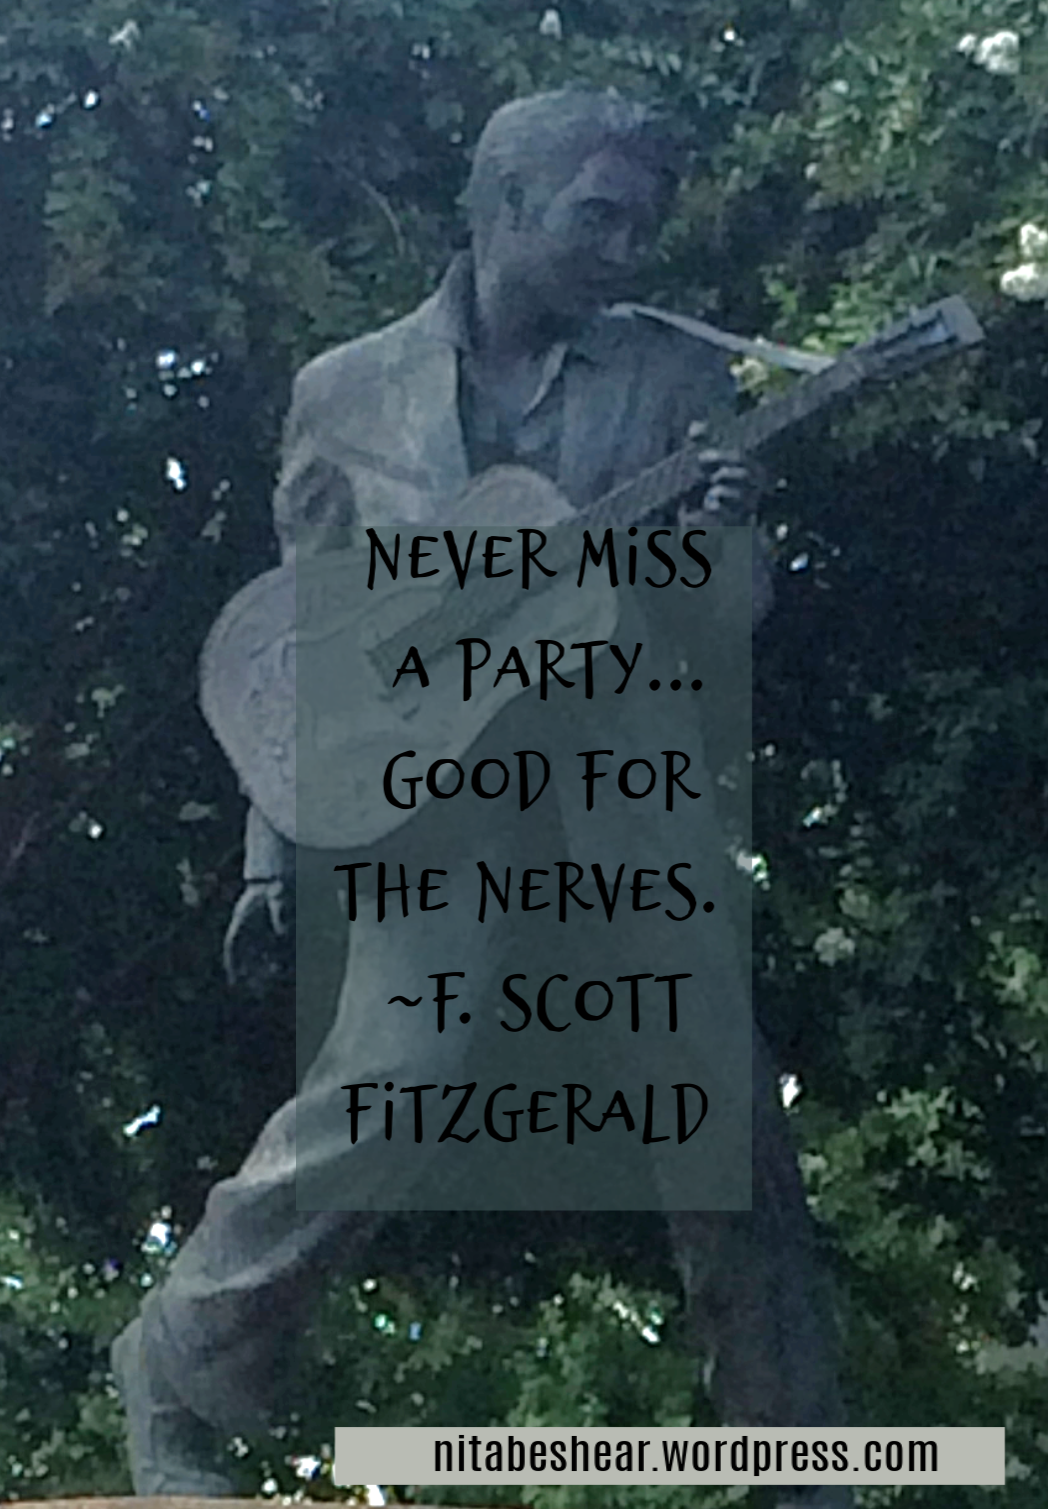 Elvis Statue and quote 2018